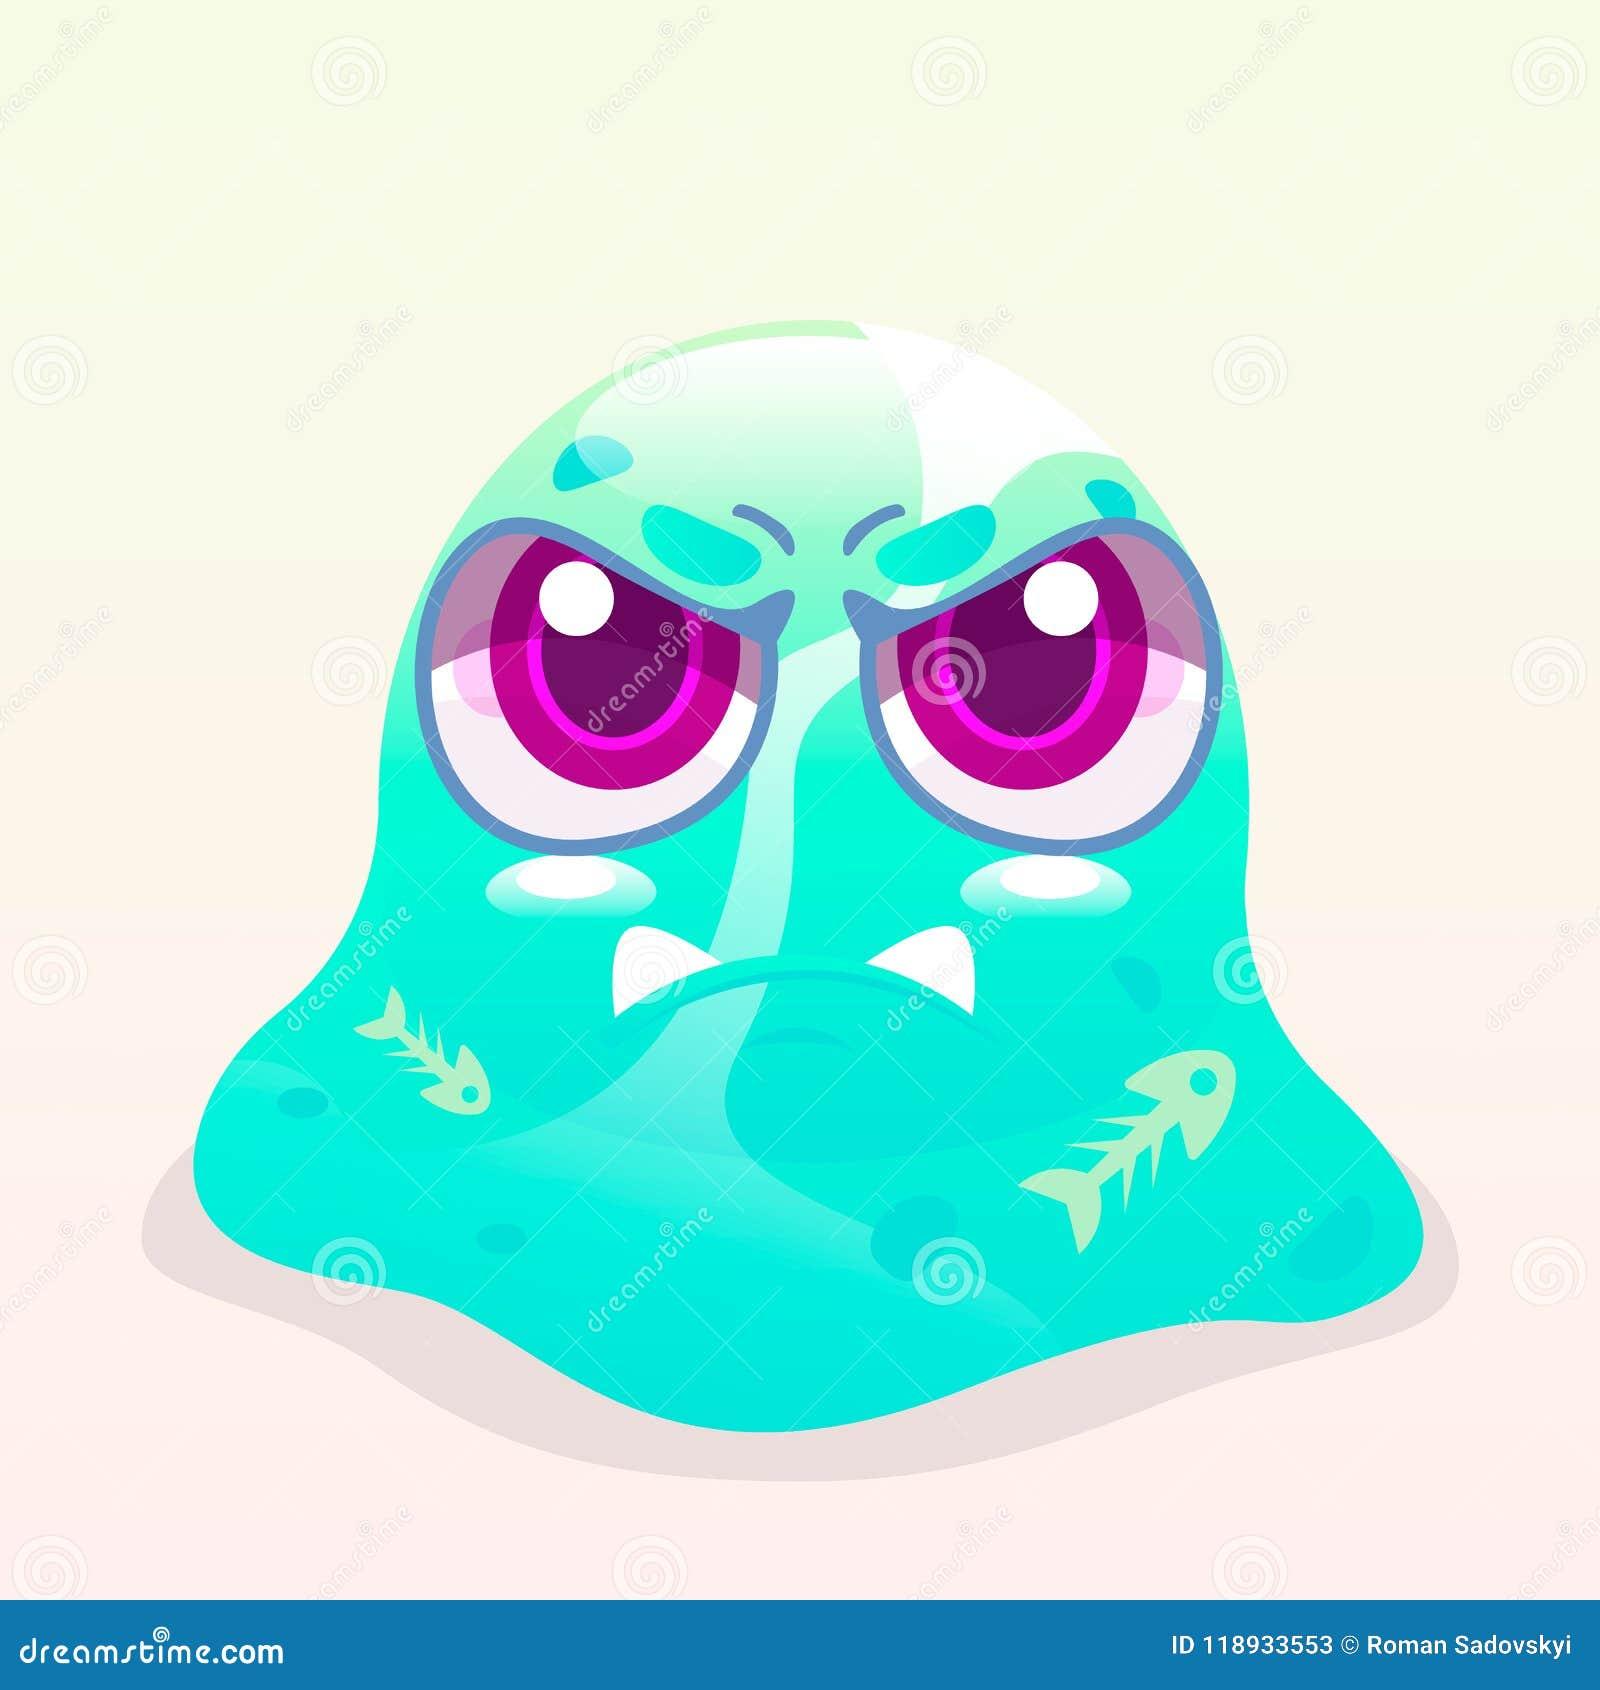 Angry Slime Monster Stock Vector Illustration Of Slime 118933553